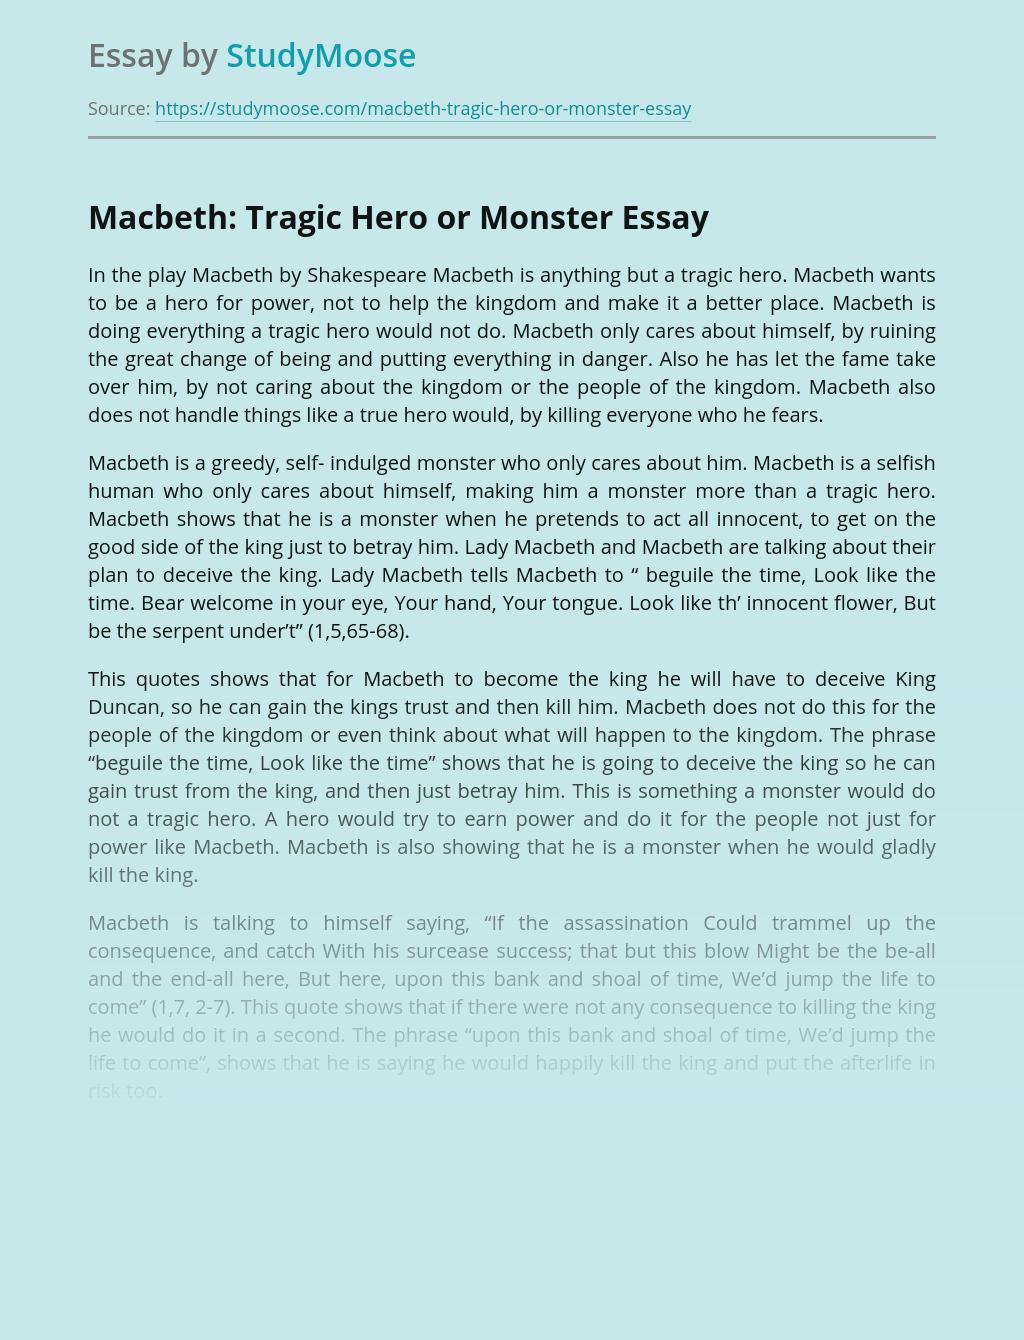 Macbeth: Tragic Hero or Monster